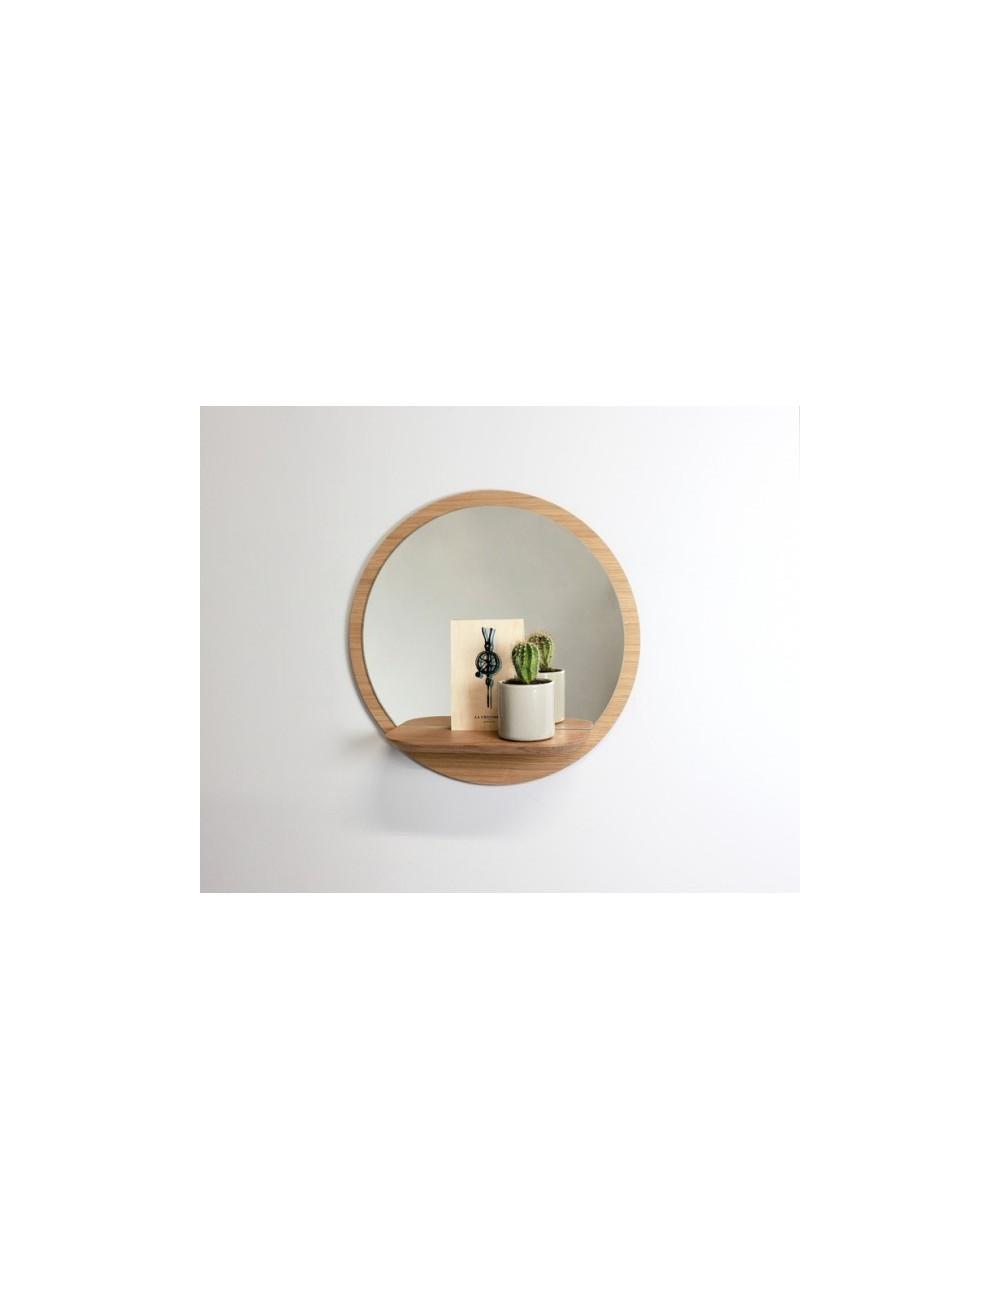 Sunrise - Le grand  miroir avec tablette made in France reine mère